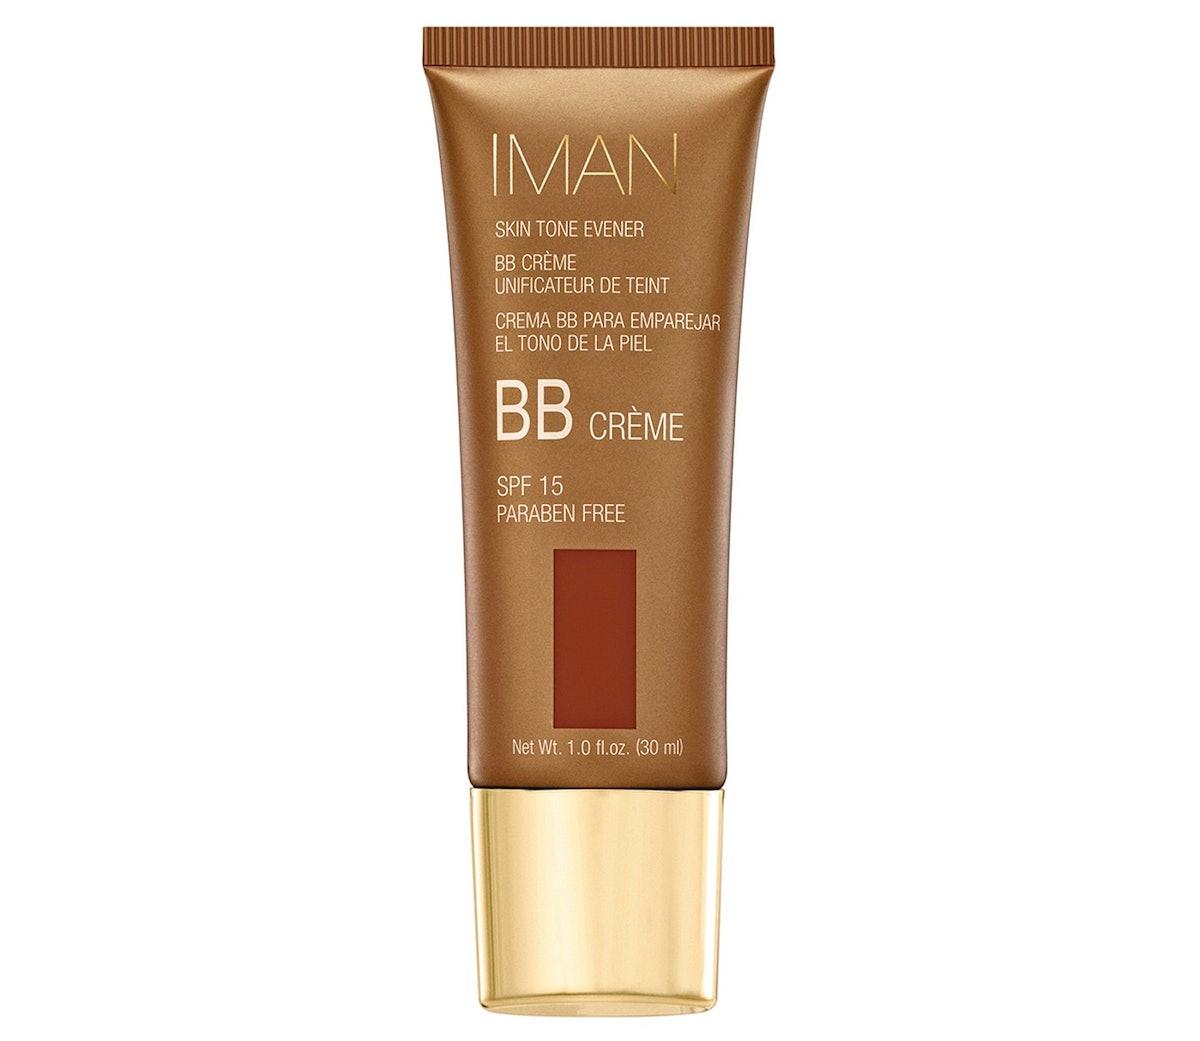 Skin Tone Evener BB CRÈME SPF 15